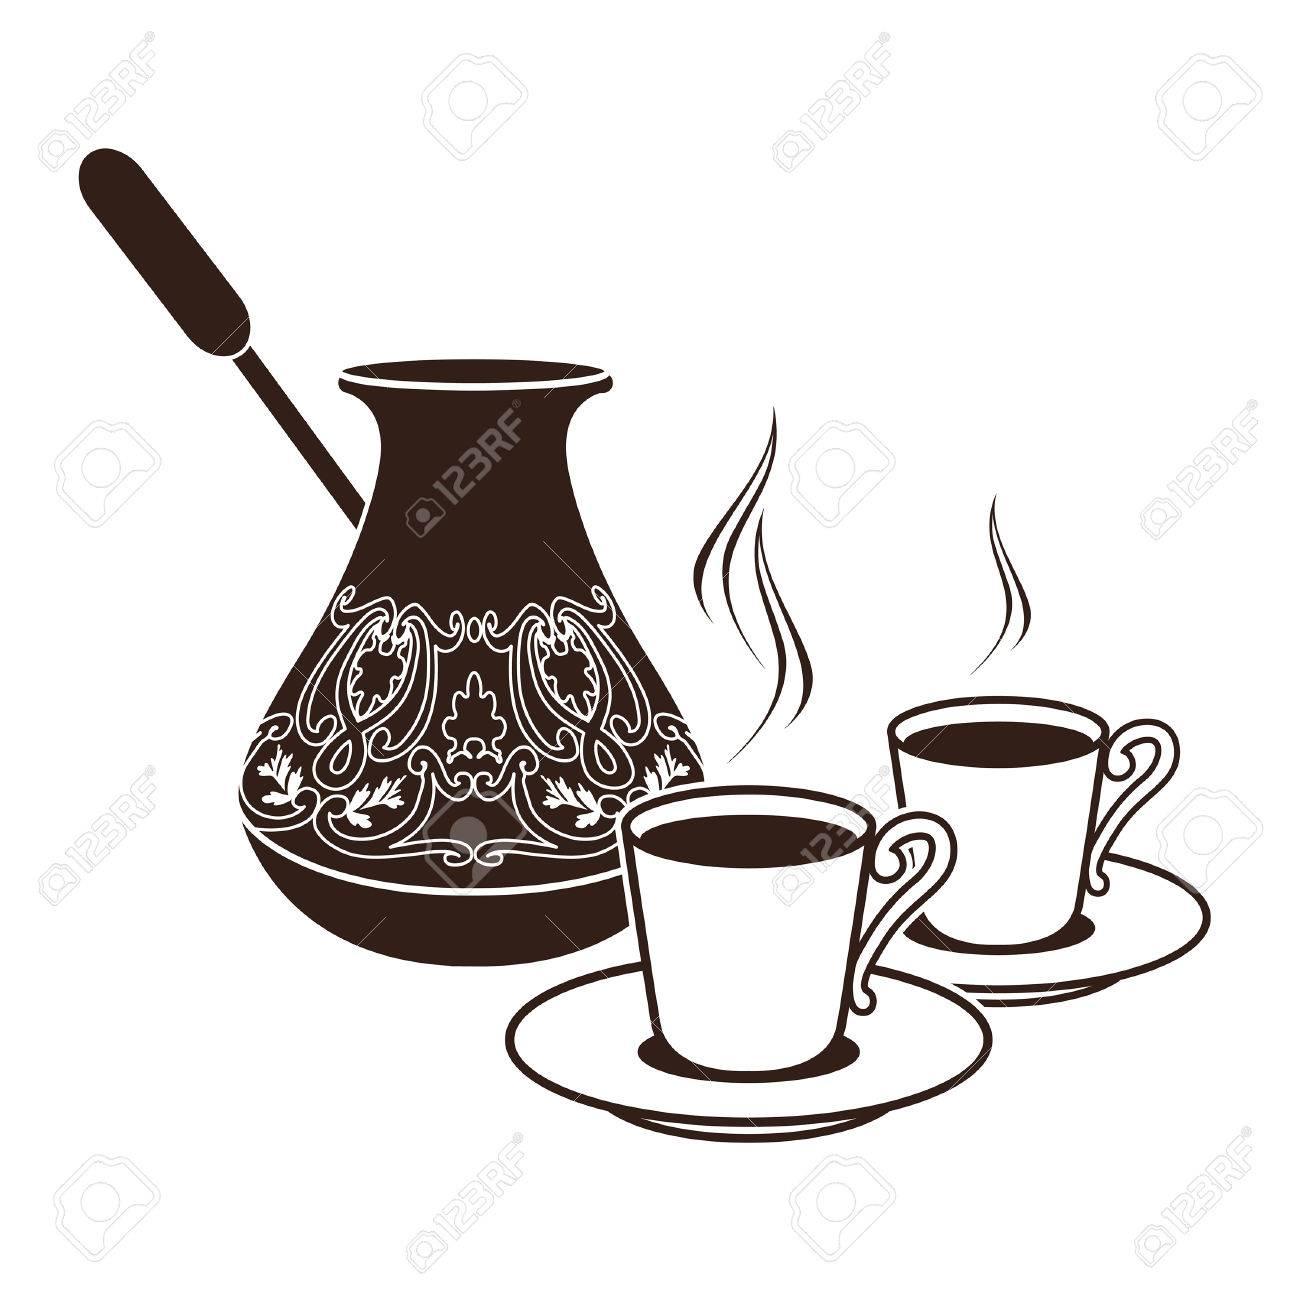 Pretty Hot Turkish Coffee Pots Two Cups Stock Vector Hot Turkish Coffee Pots Two Cups Royalty Free Vectors Espresso Turkish Coffee Cups furniture Turkish Espresso Cups